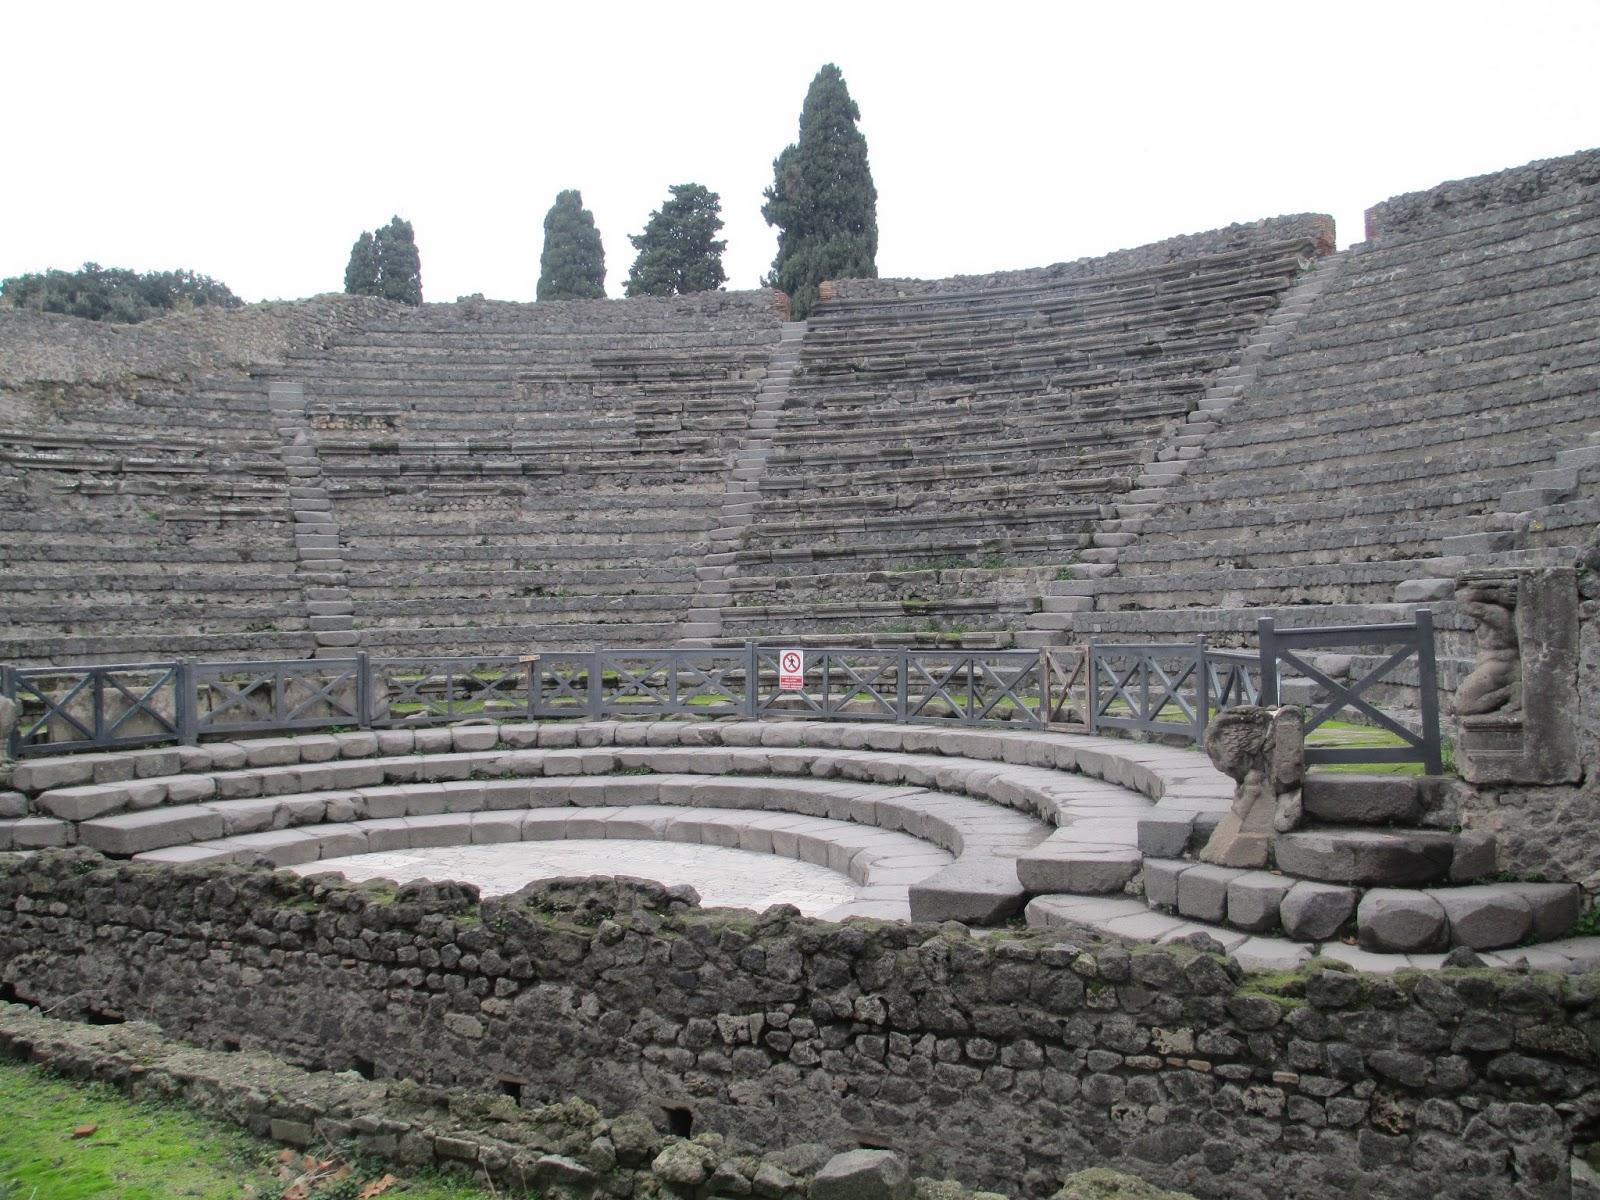 Teatro pequeño en Pompeya